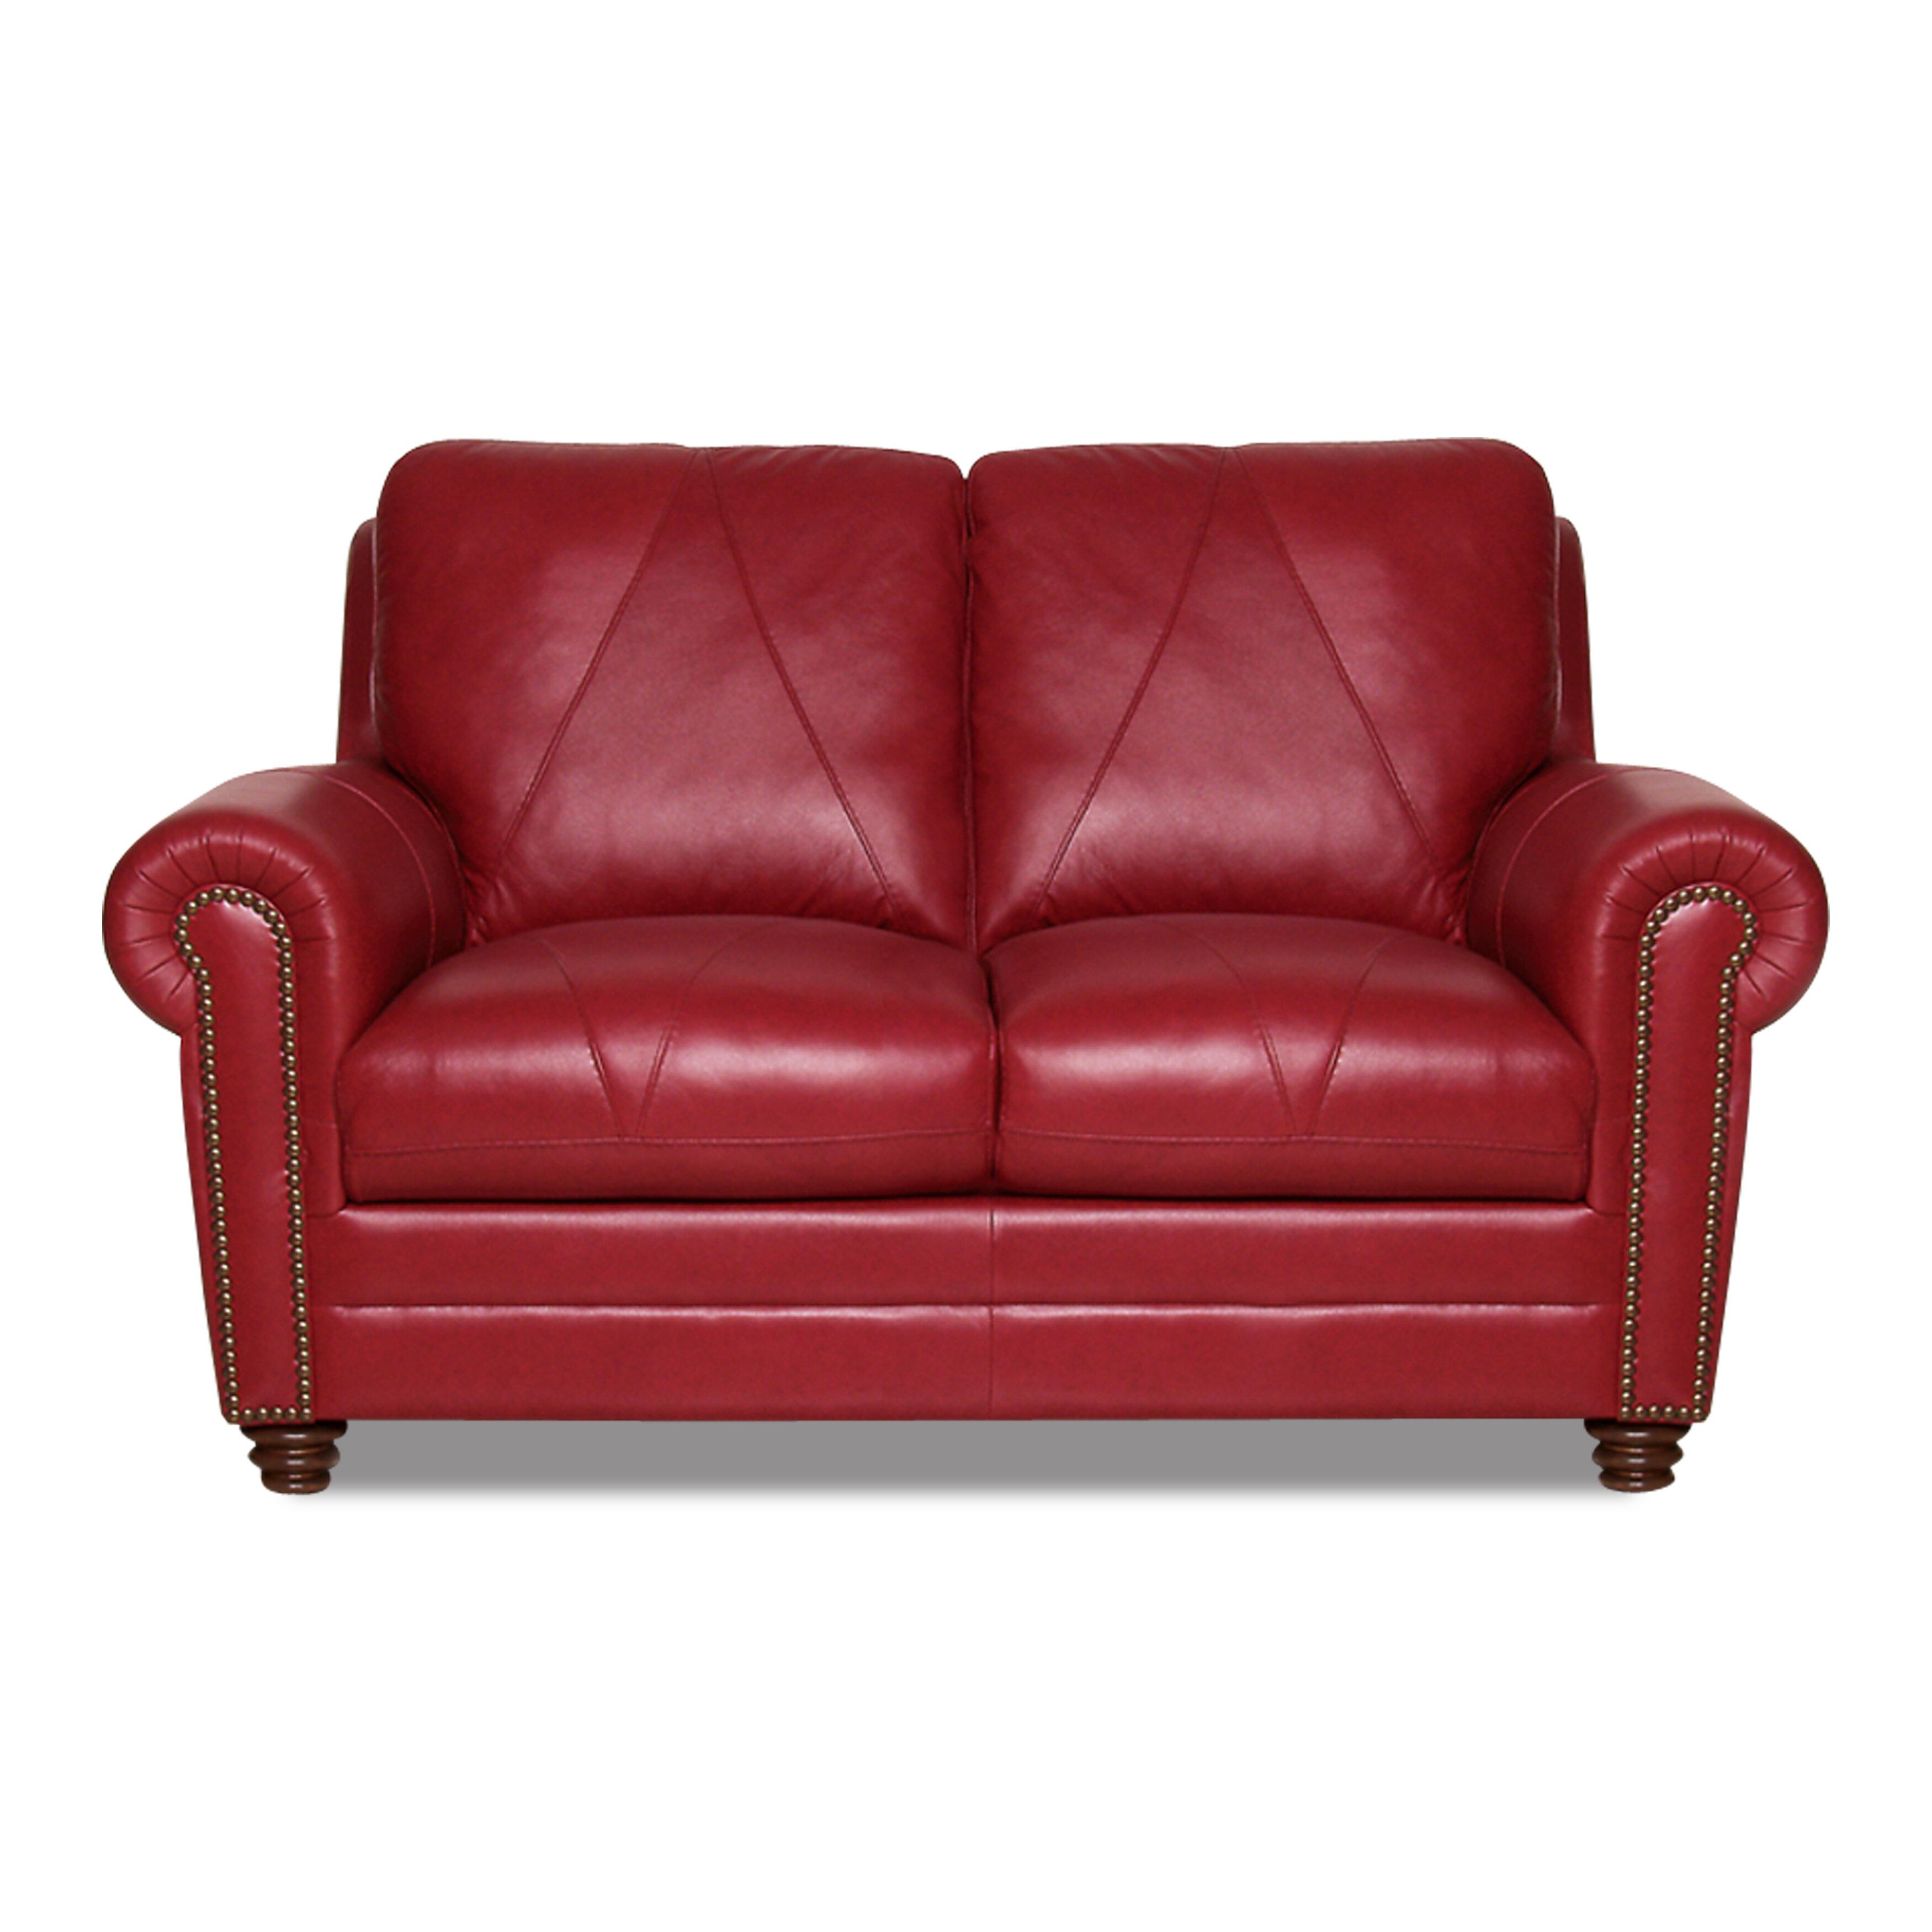 Terrific Priddy Leather Loveseat Machost Co Dining Chair Design Ideas Machostcouk